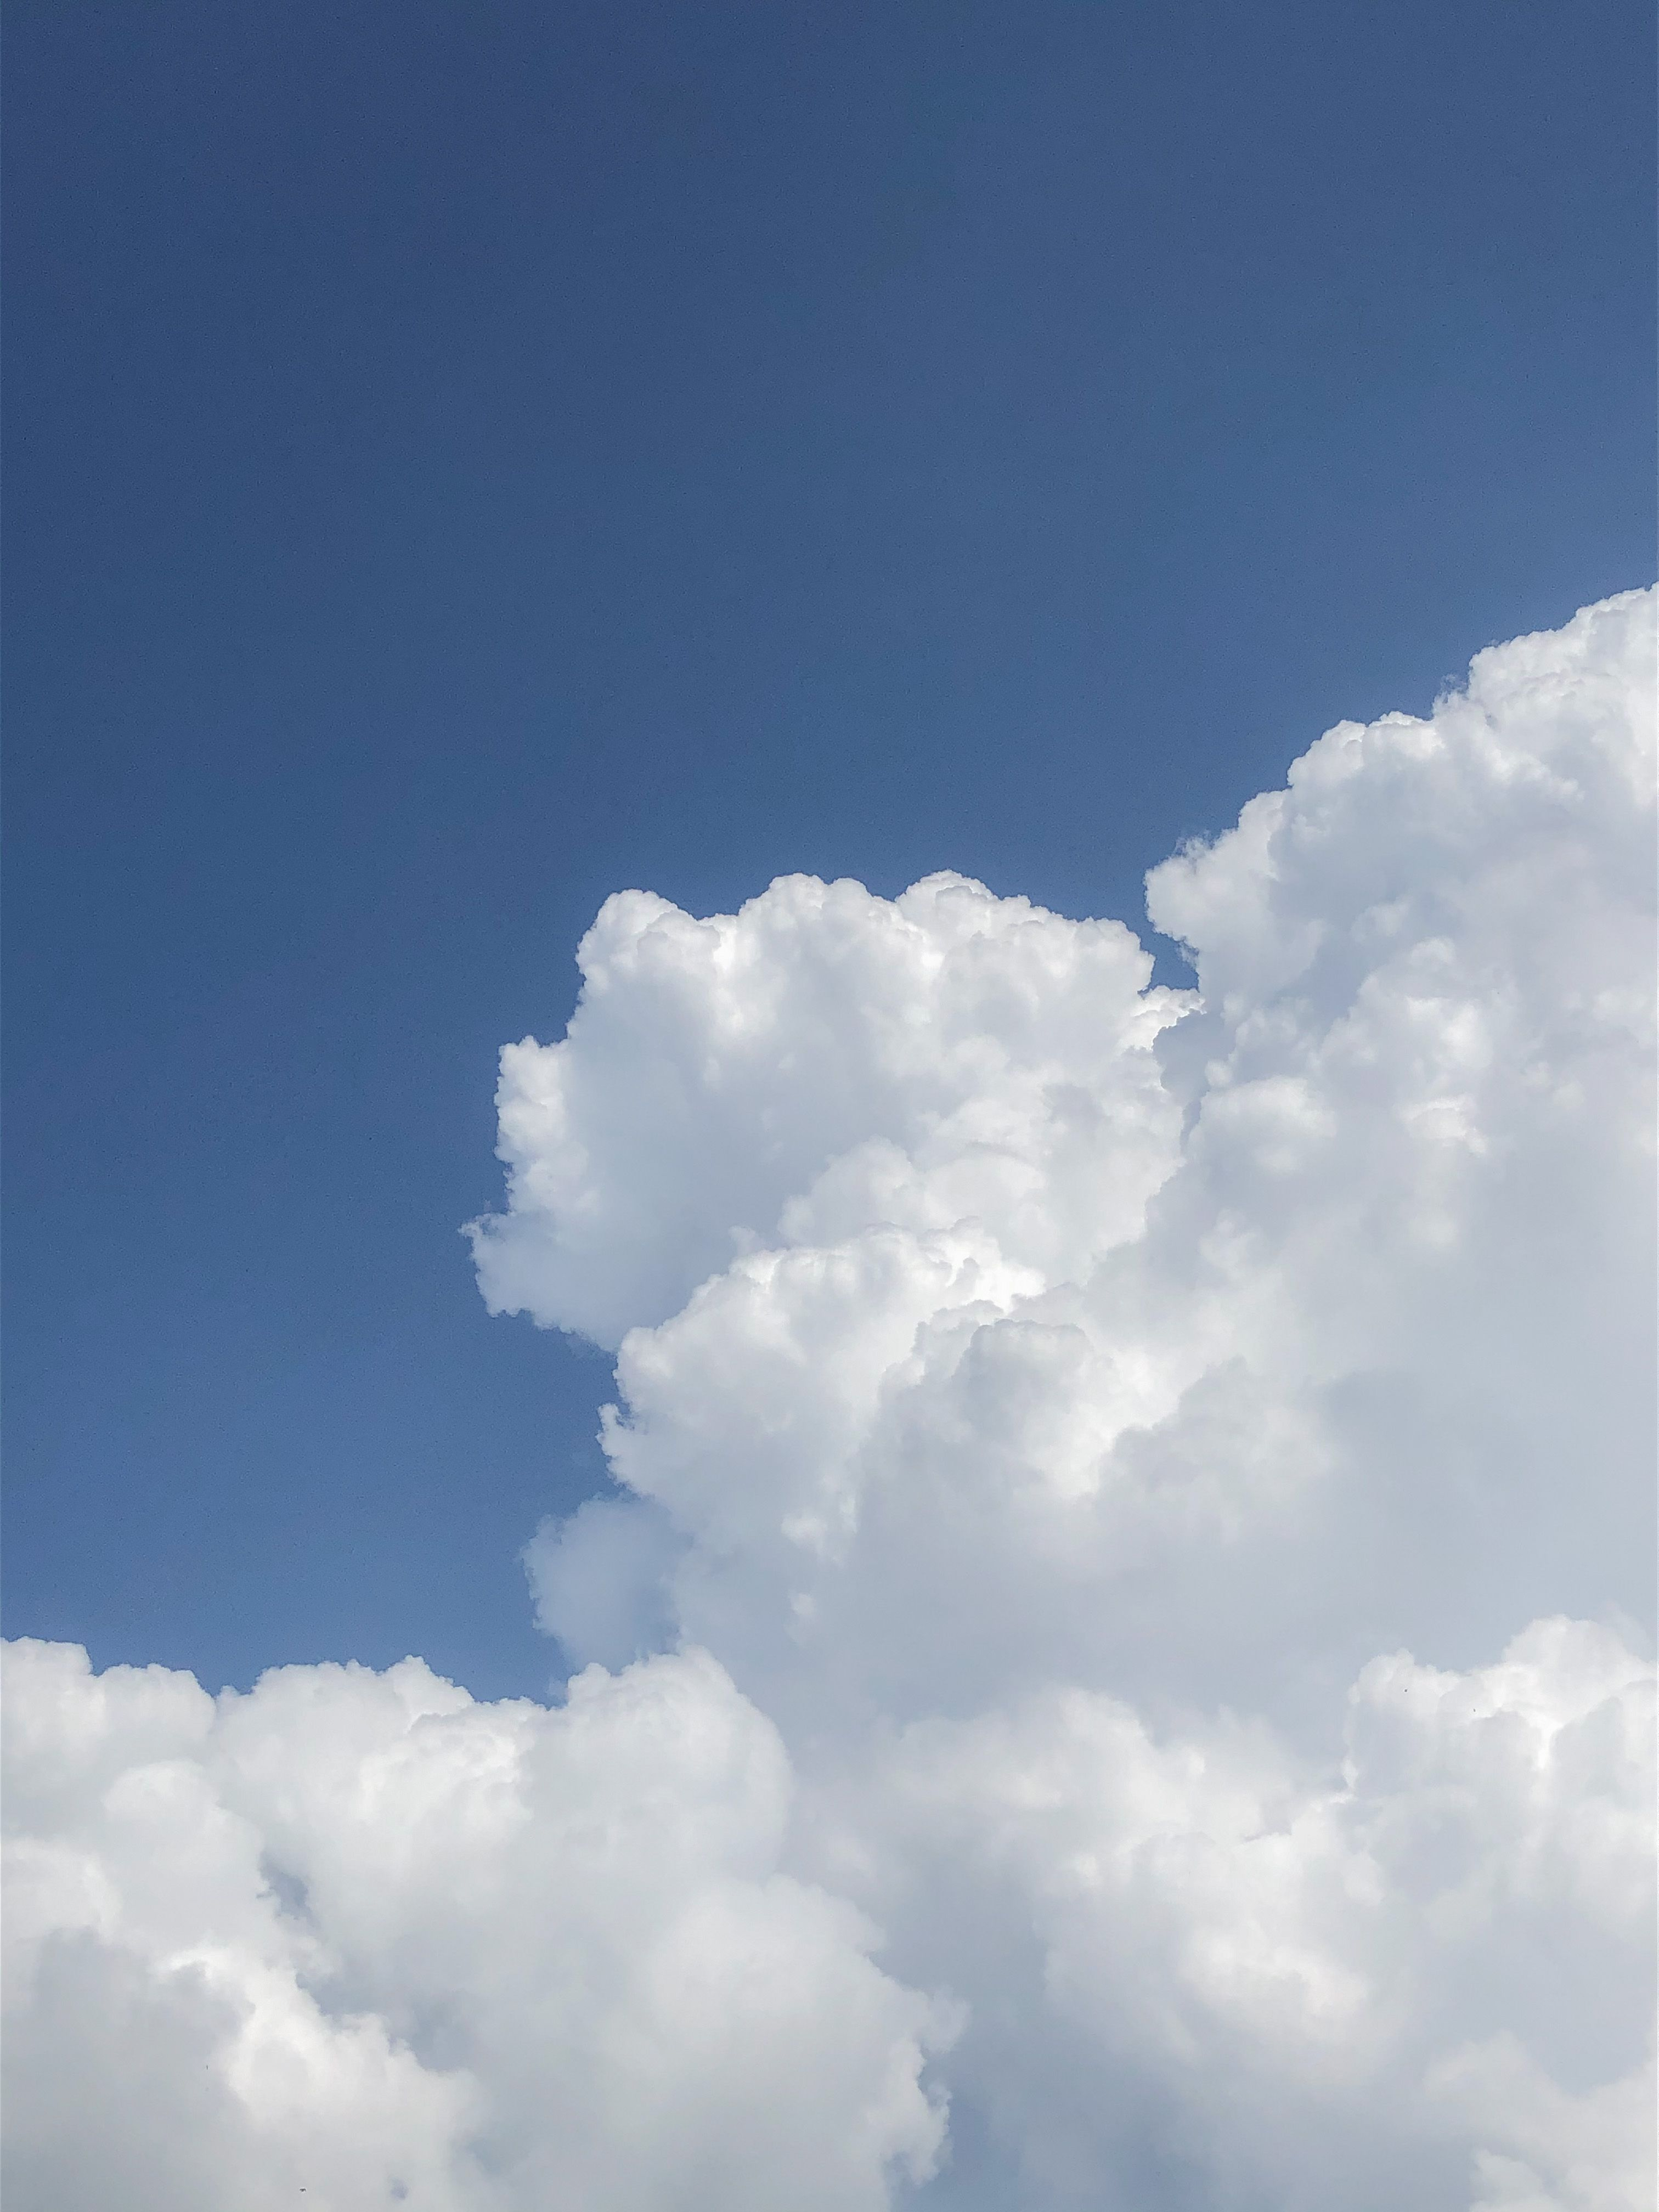 Clouds Blue Sky Photography Blue Sky Wallpaper Blue Sky Clouds